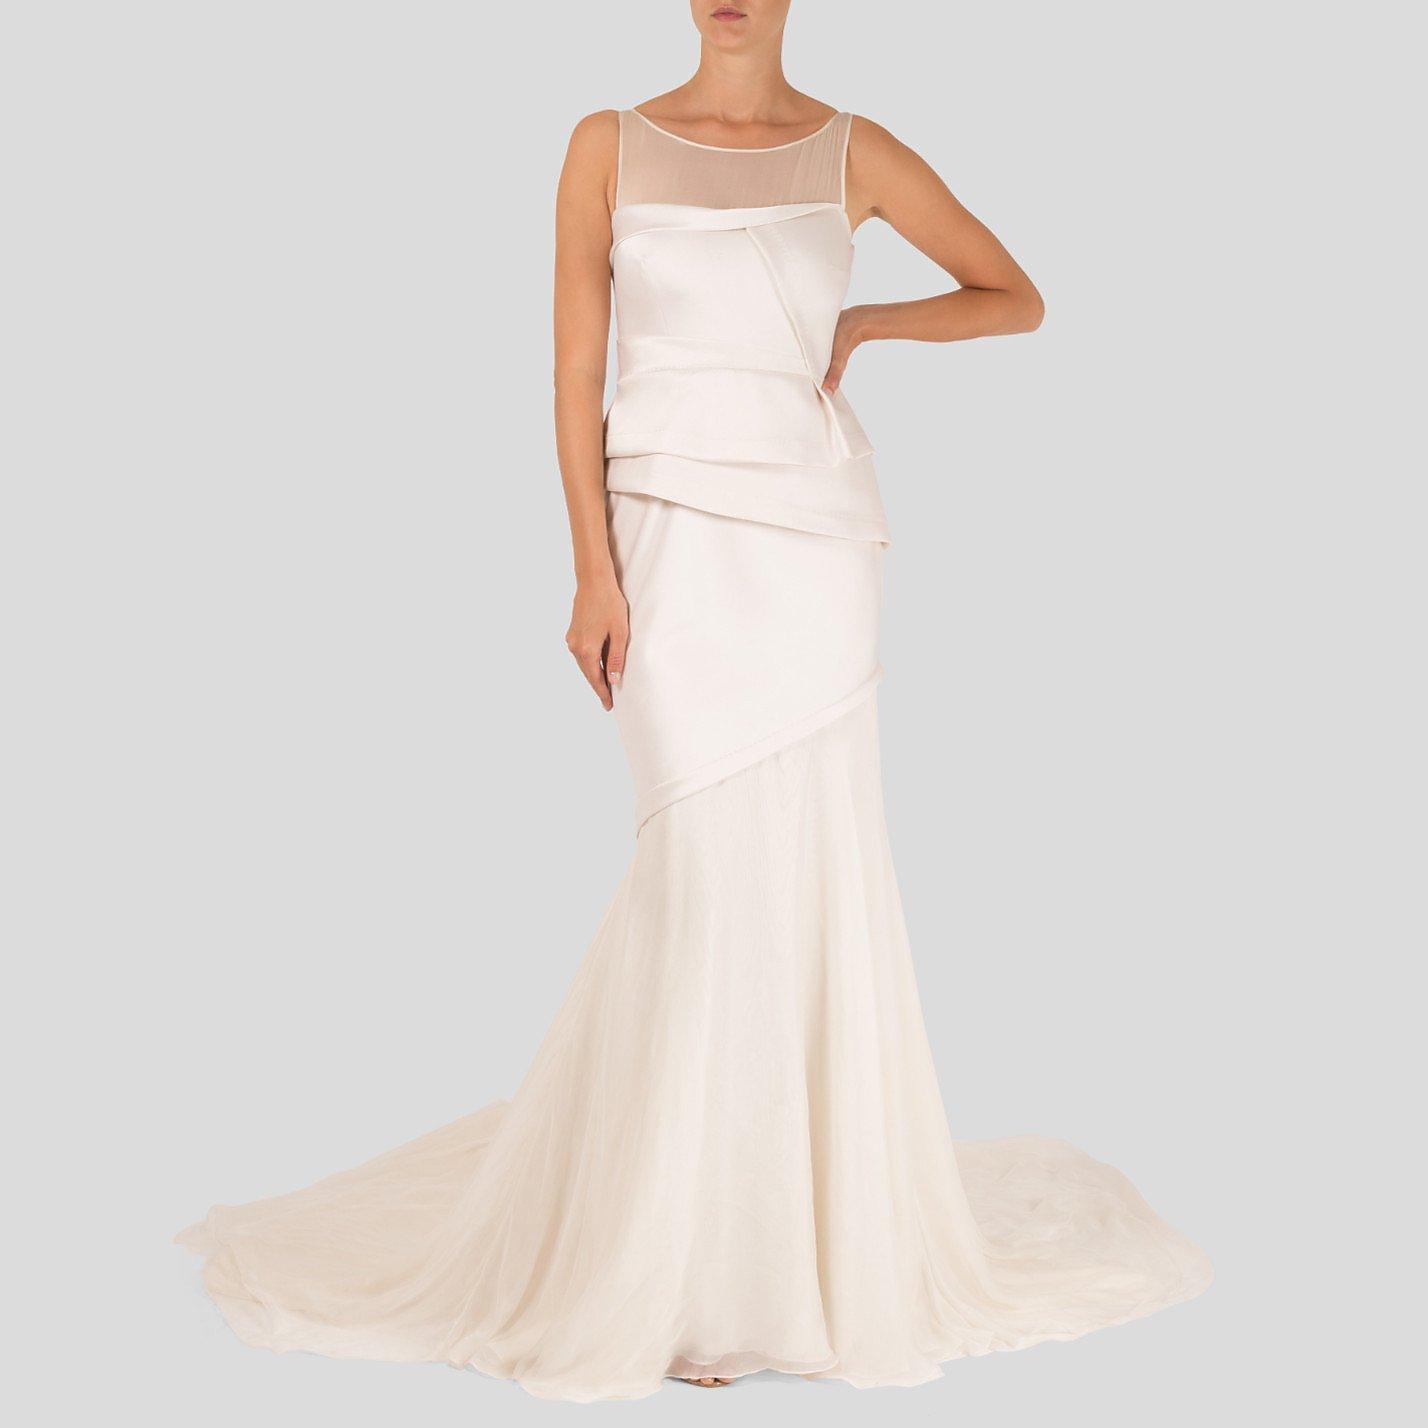 Amanda Wakeley Bridal Allure Bridal Dress